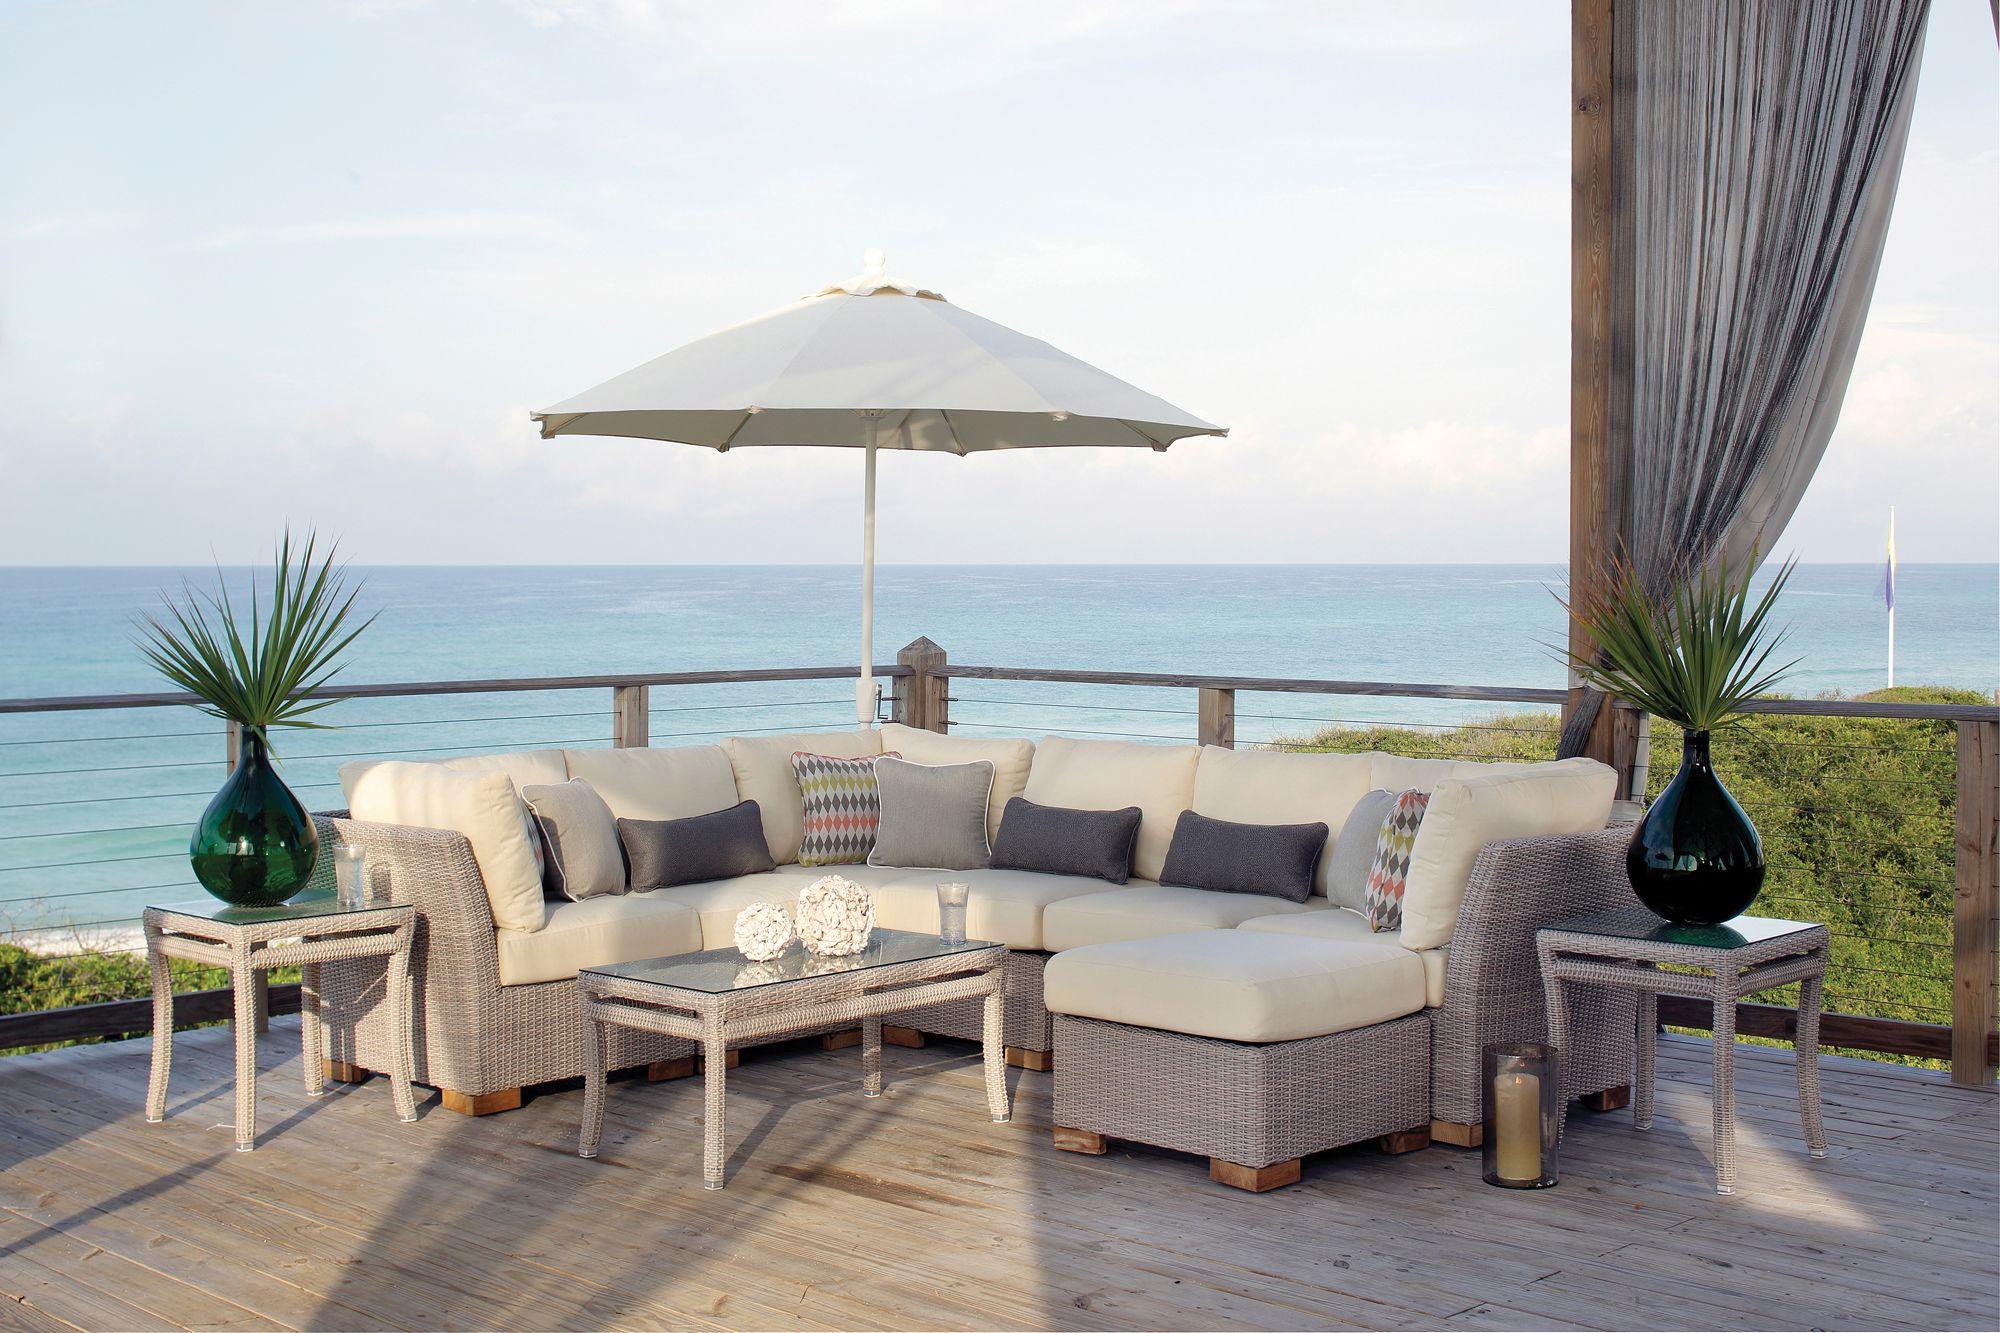 Club Woven Summer Classics Luxury Outdoor Furniture Summer Classics Outdoor Furniture Outdoor Wicker